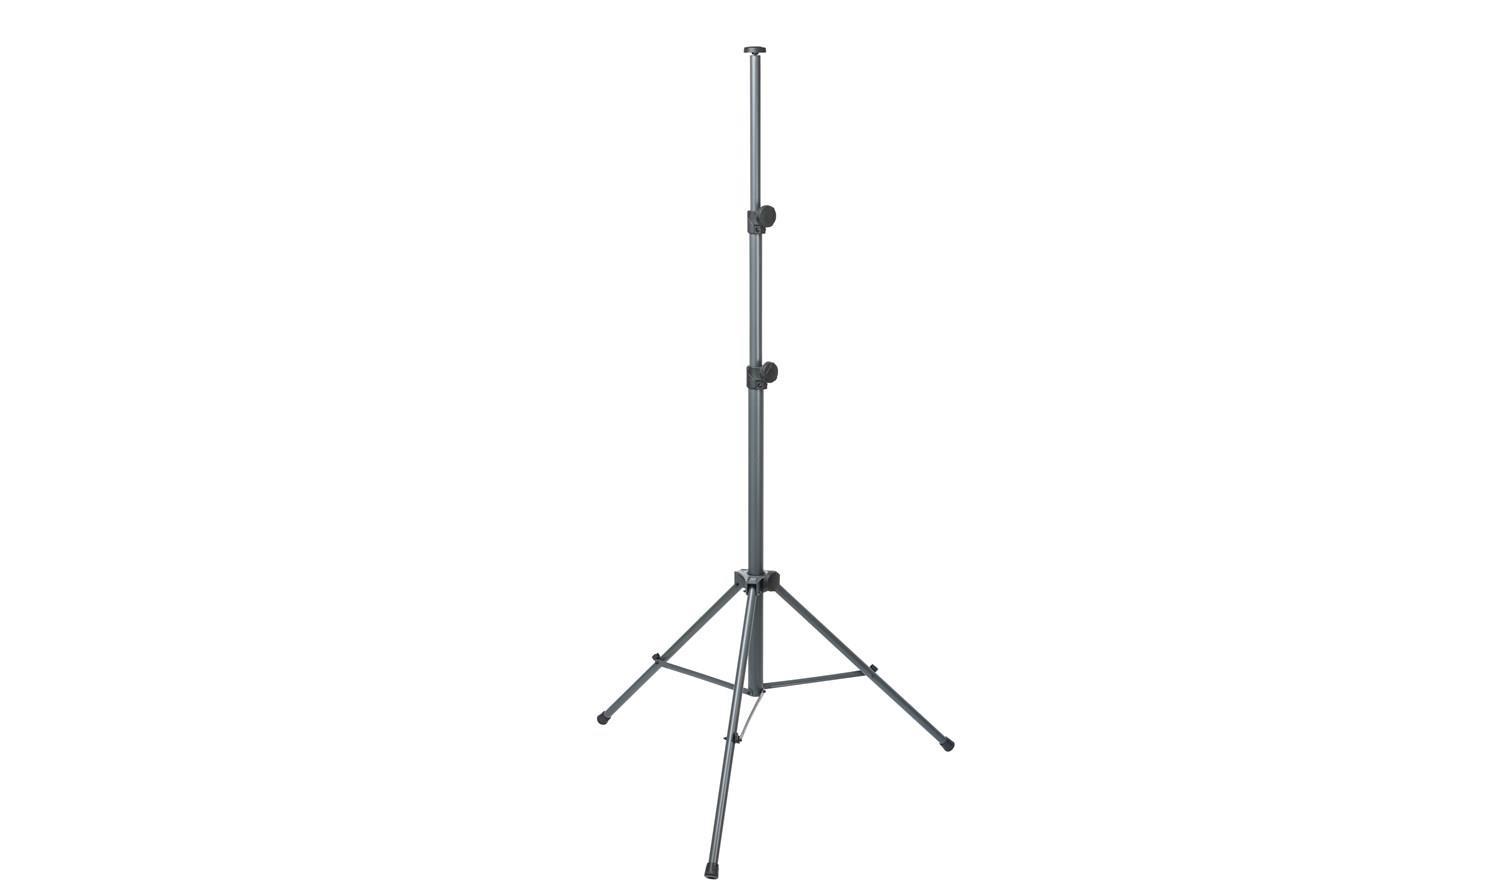 Schneider IMT33114 Stativ 1100-3100 cm